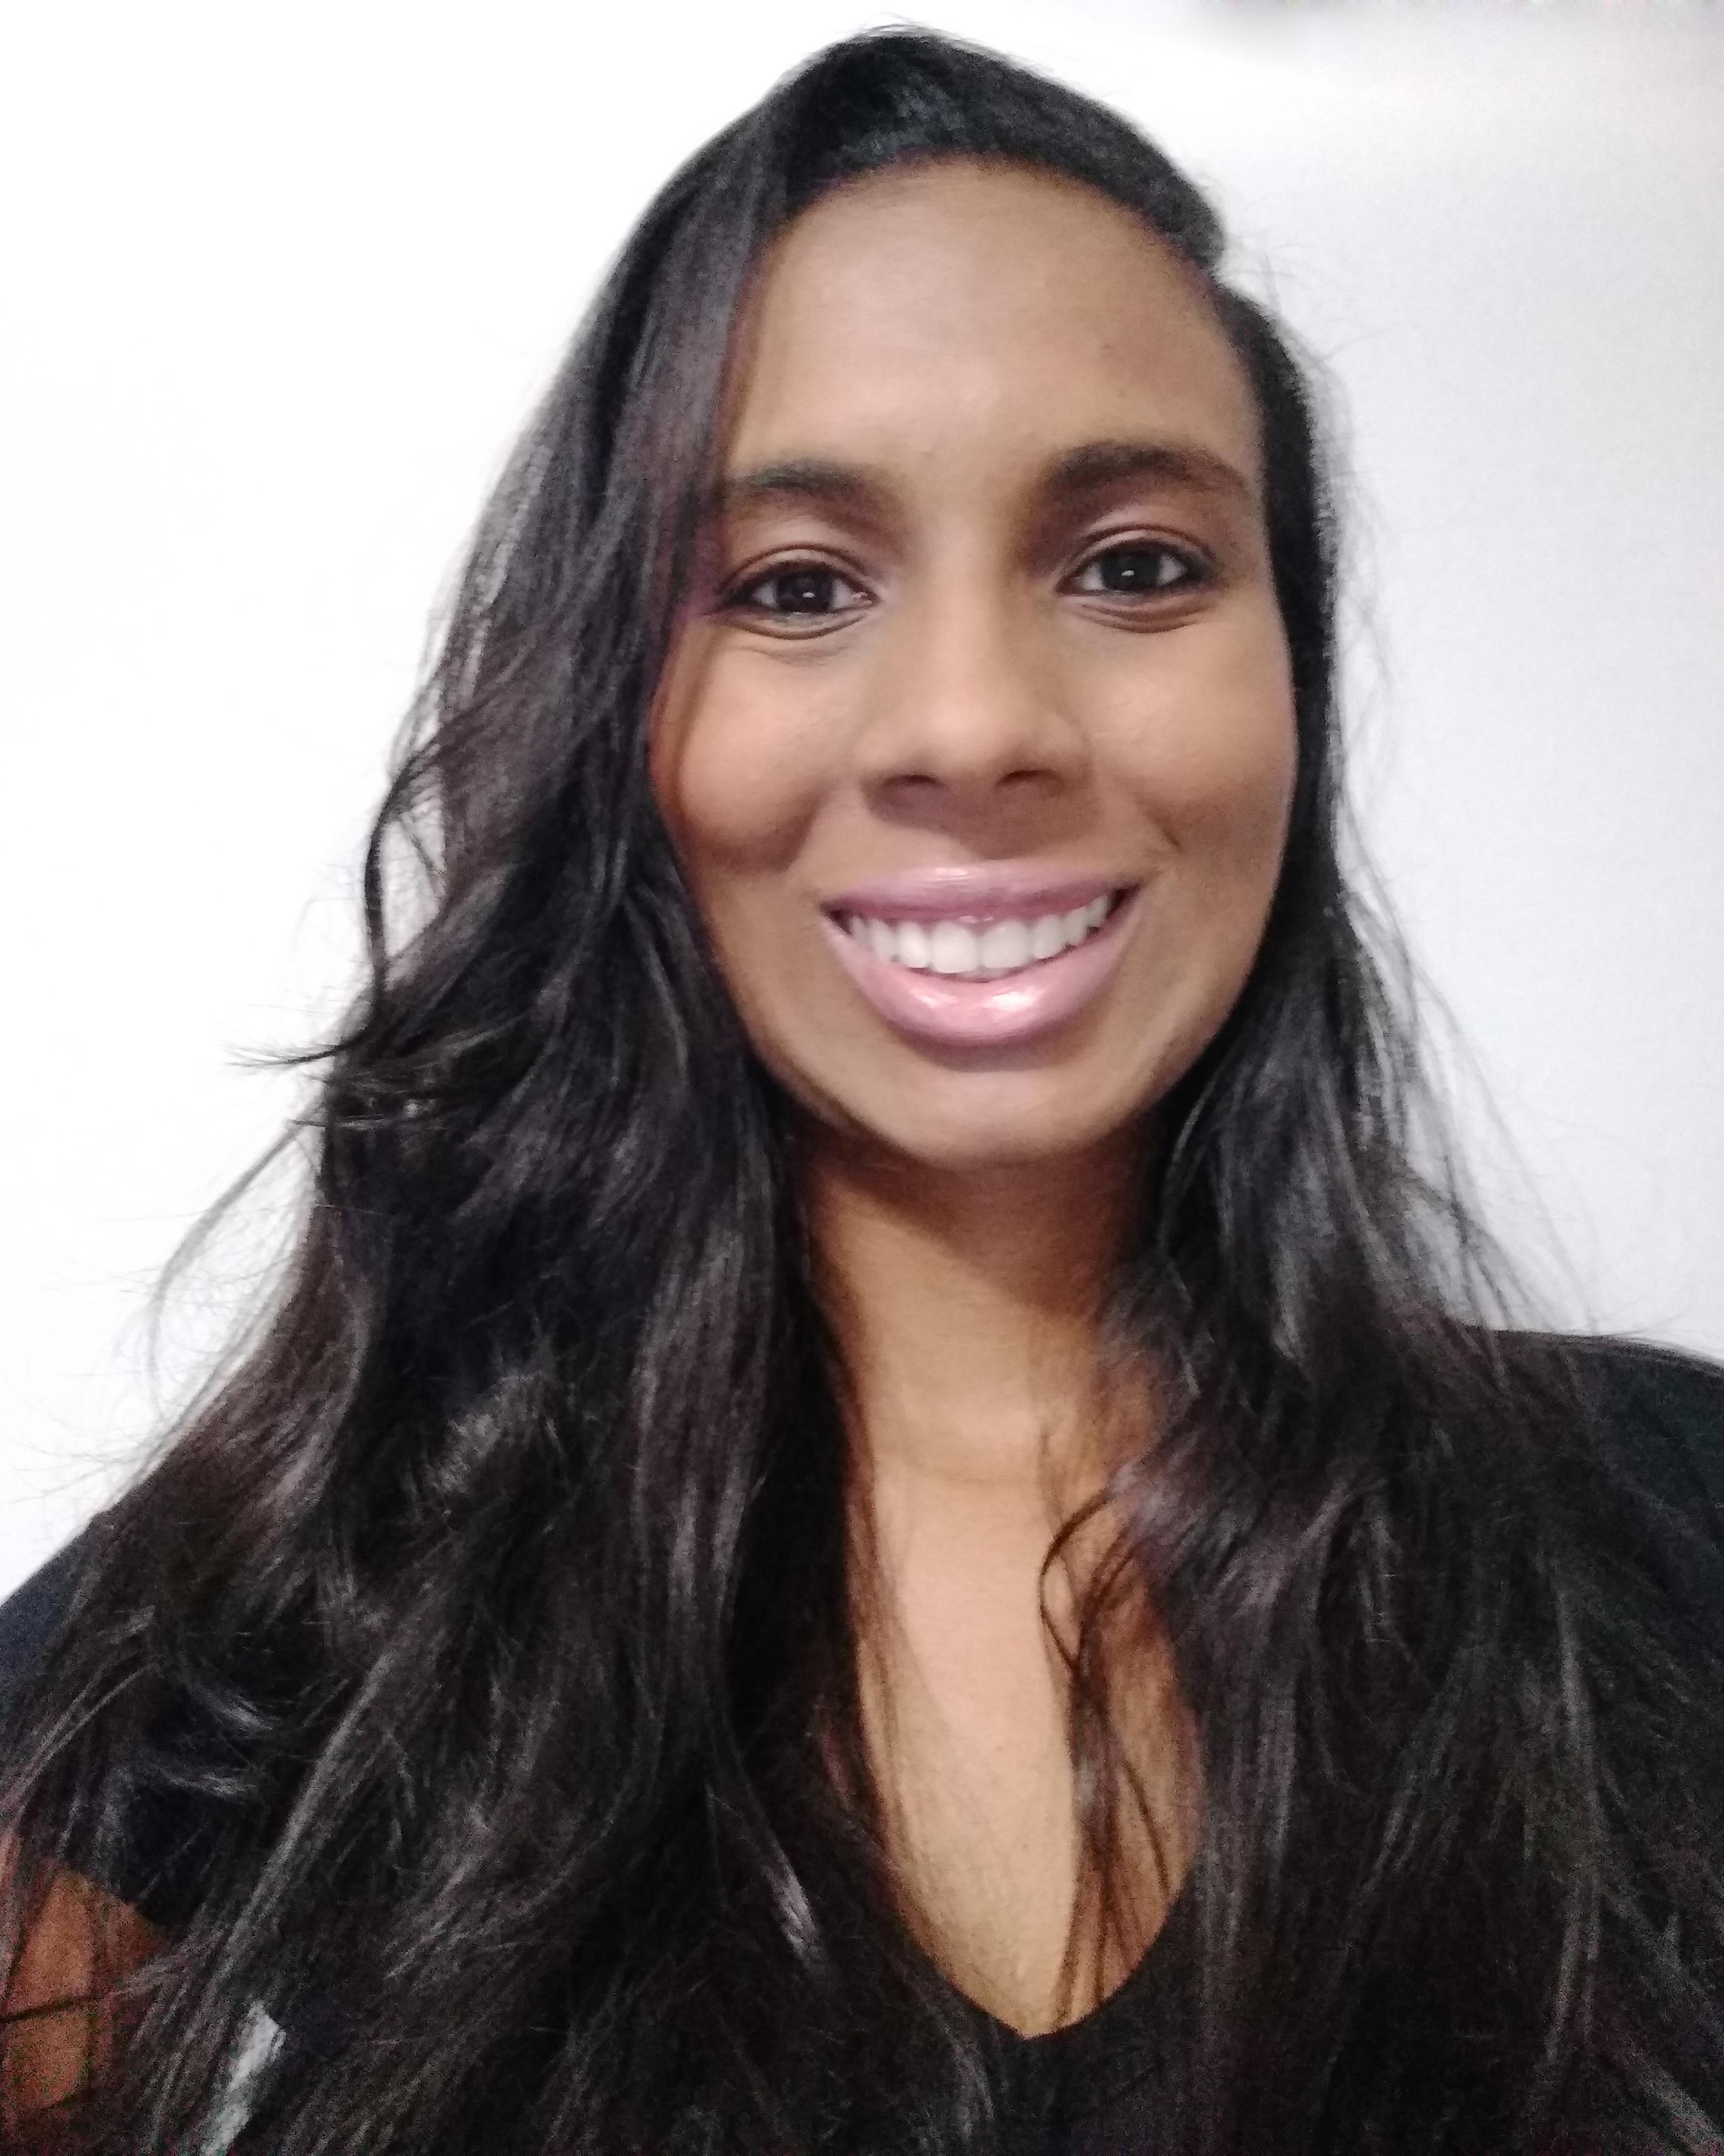 Samille de Oliveira Brito